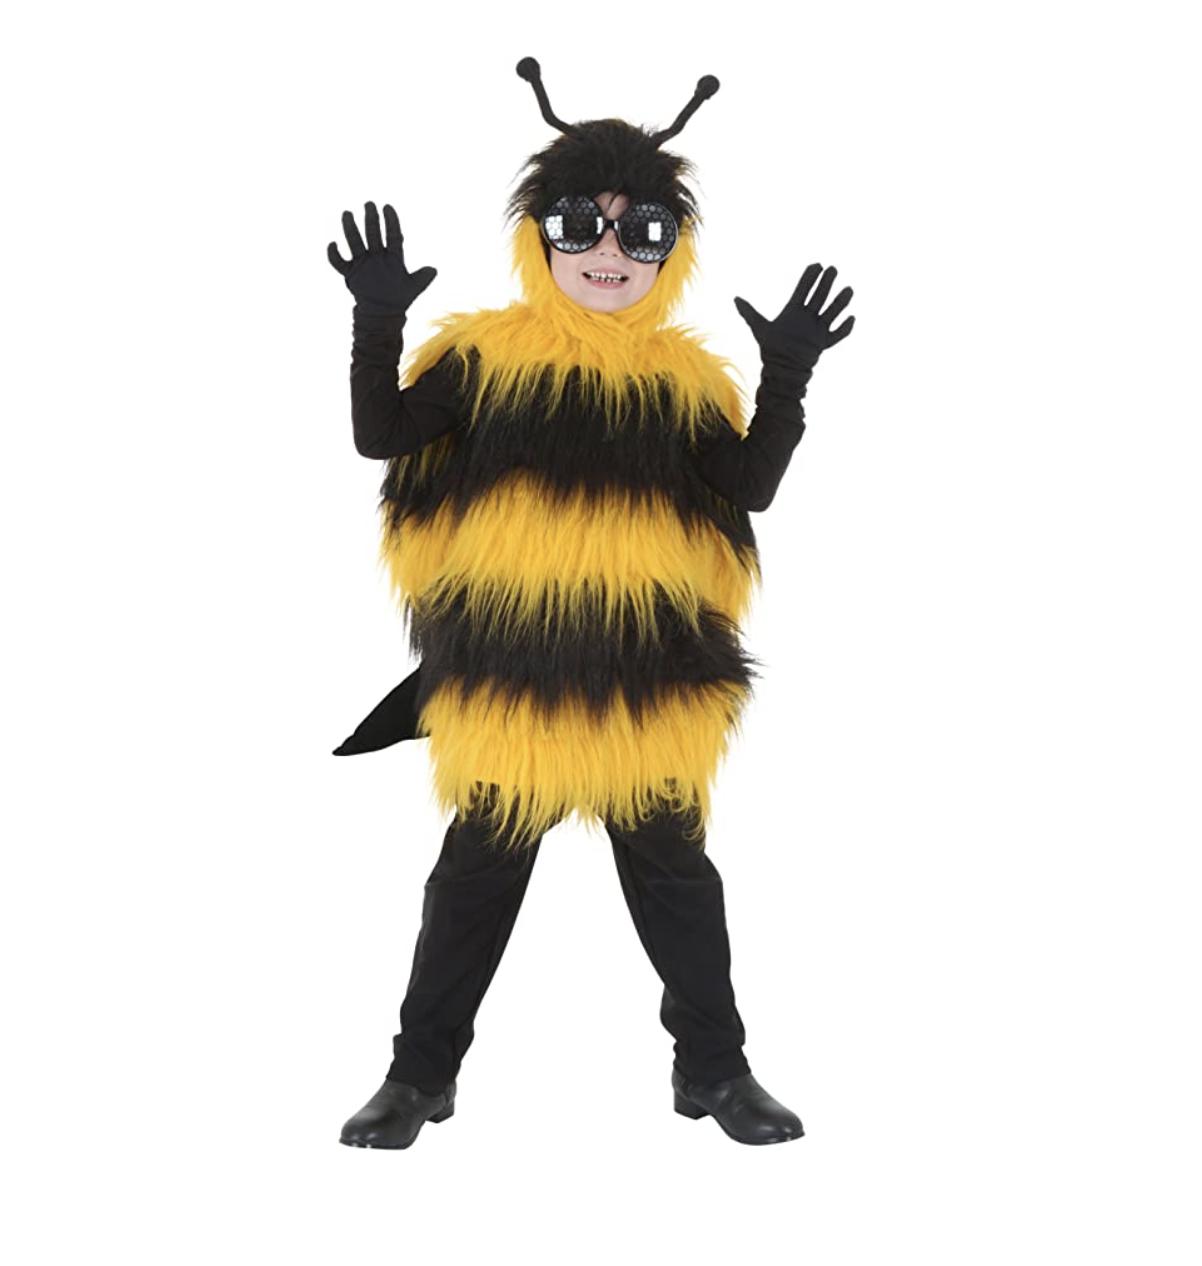 Kid in a bumblebee costume